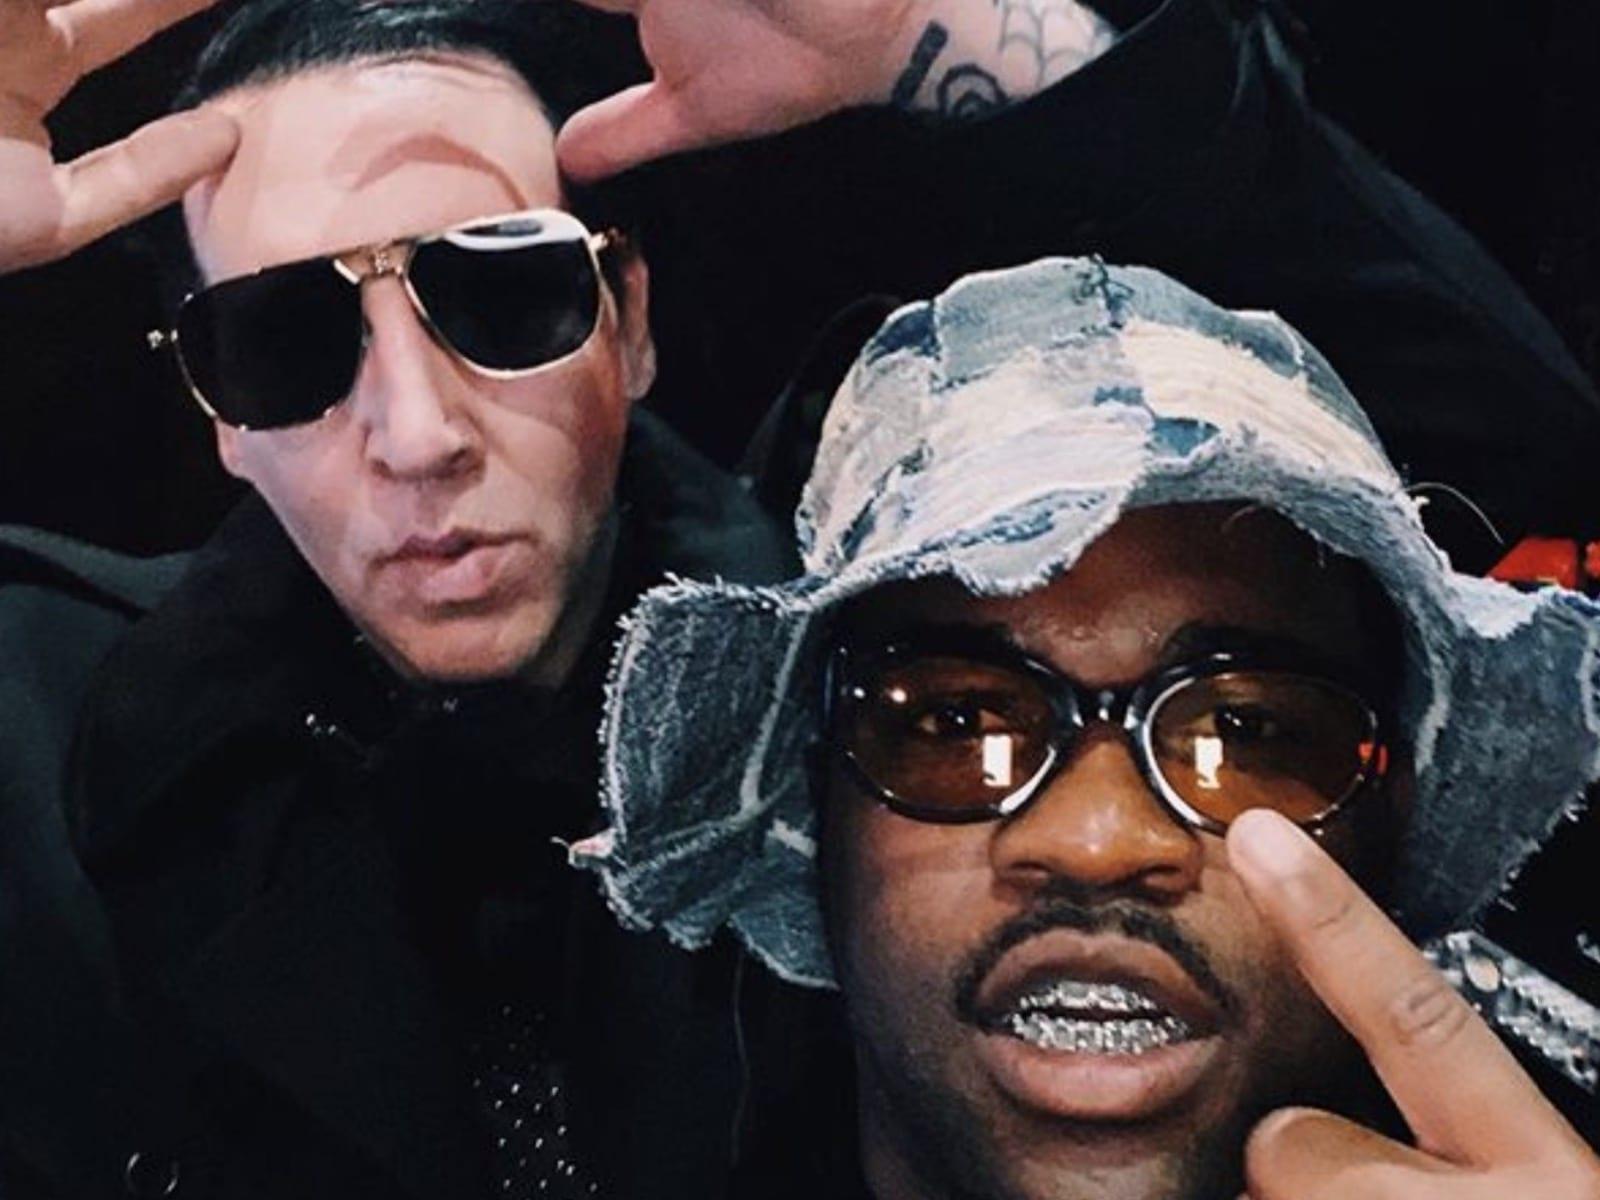 A$AP Ferg and Marilyn Manson Selfie